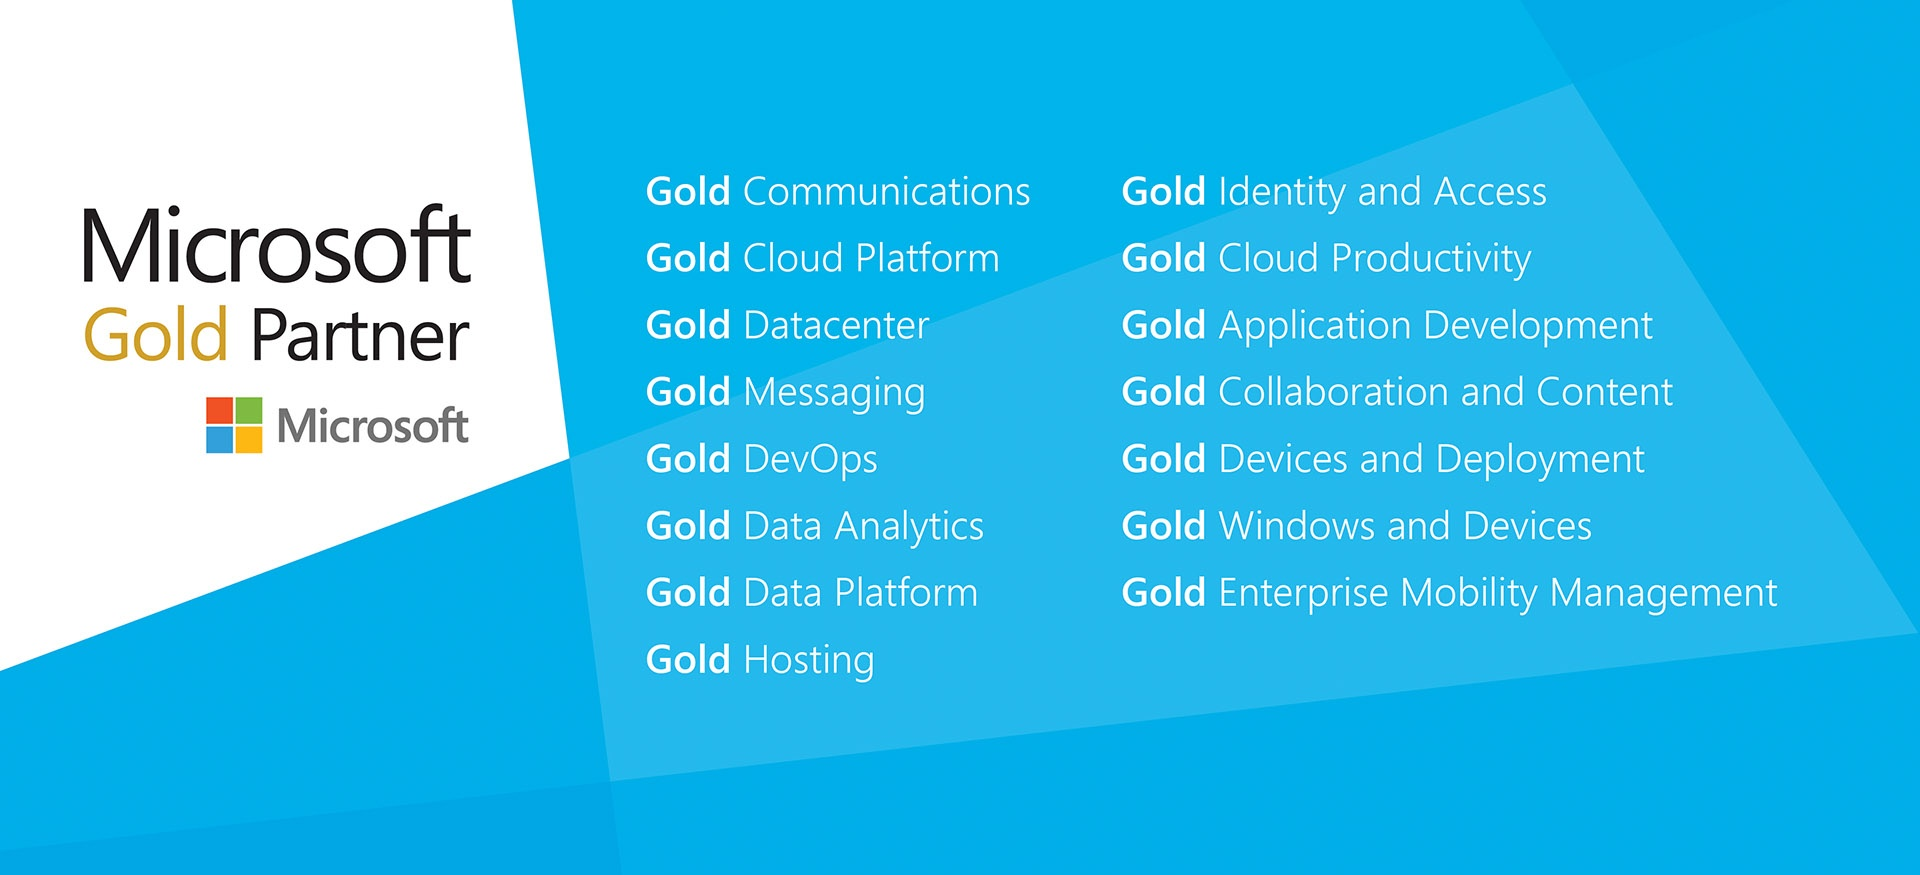 KiZAN is GOLD in 15 Areas of Microsoft